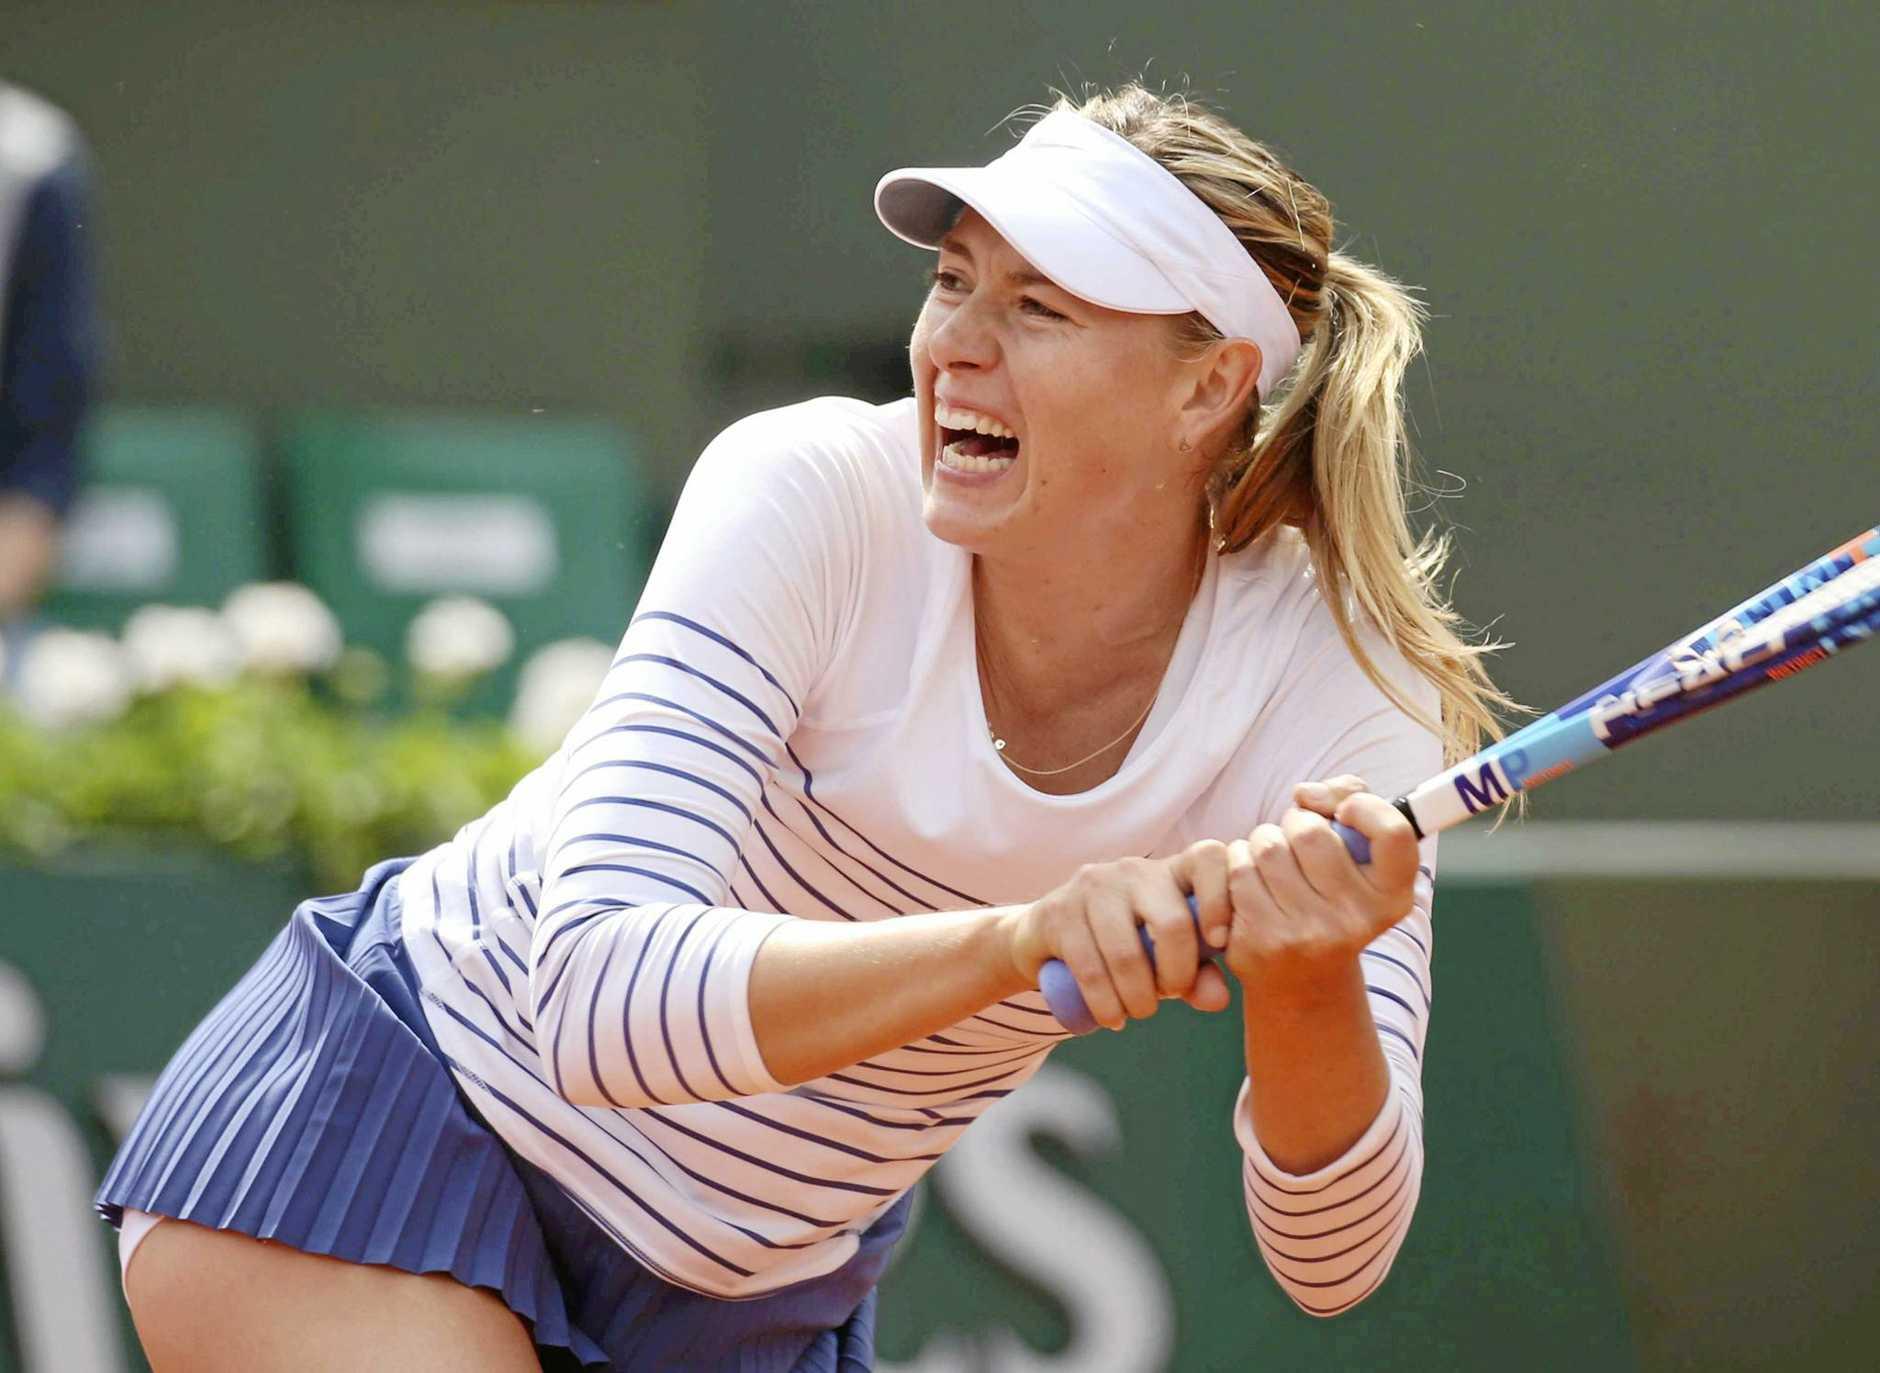 Maria Sharapova will make her long-awaited return to tennis in Stuttgart.